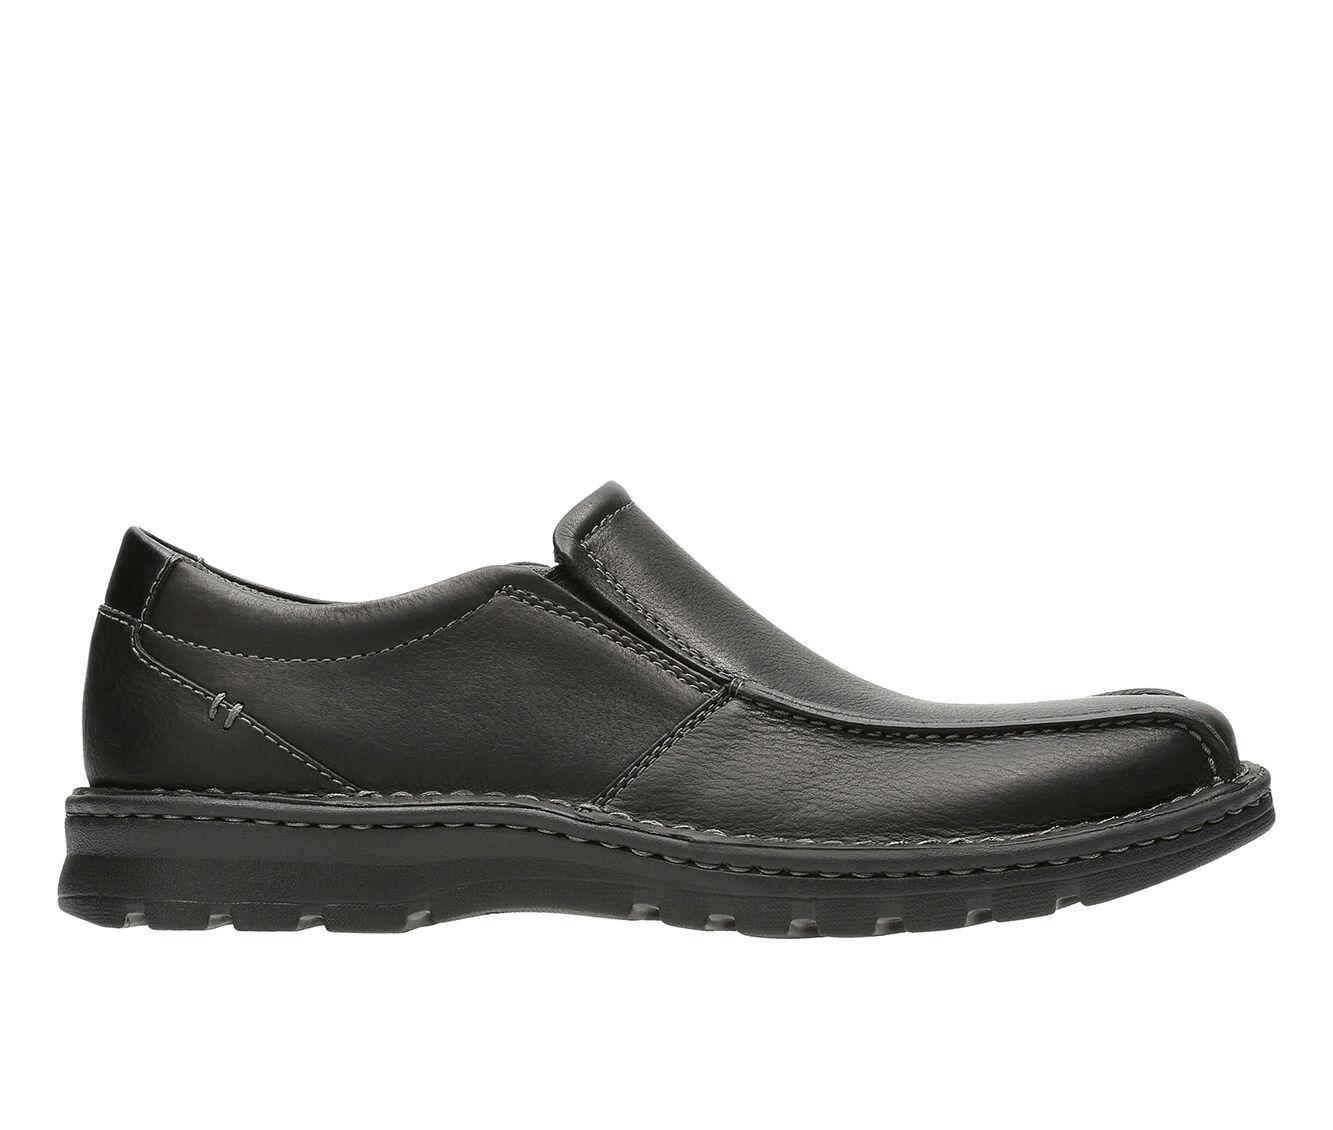 uk shoes_kd0909